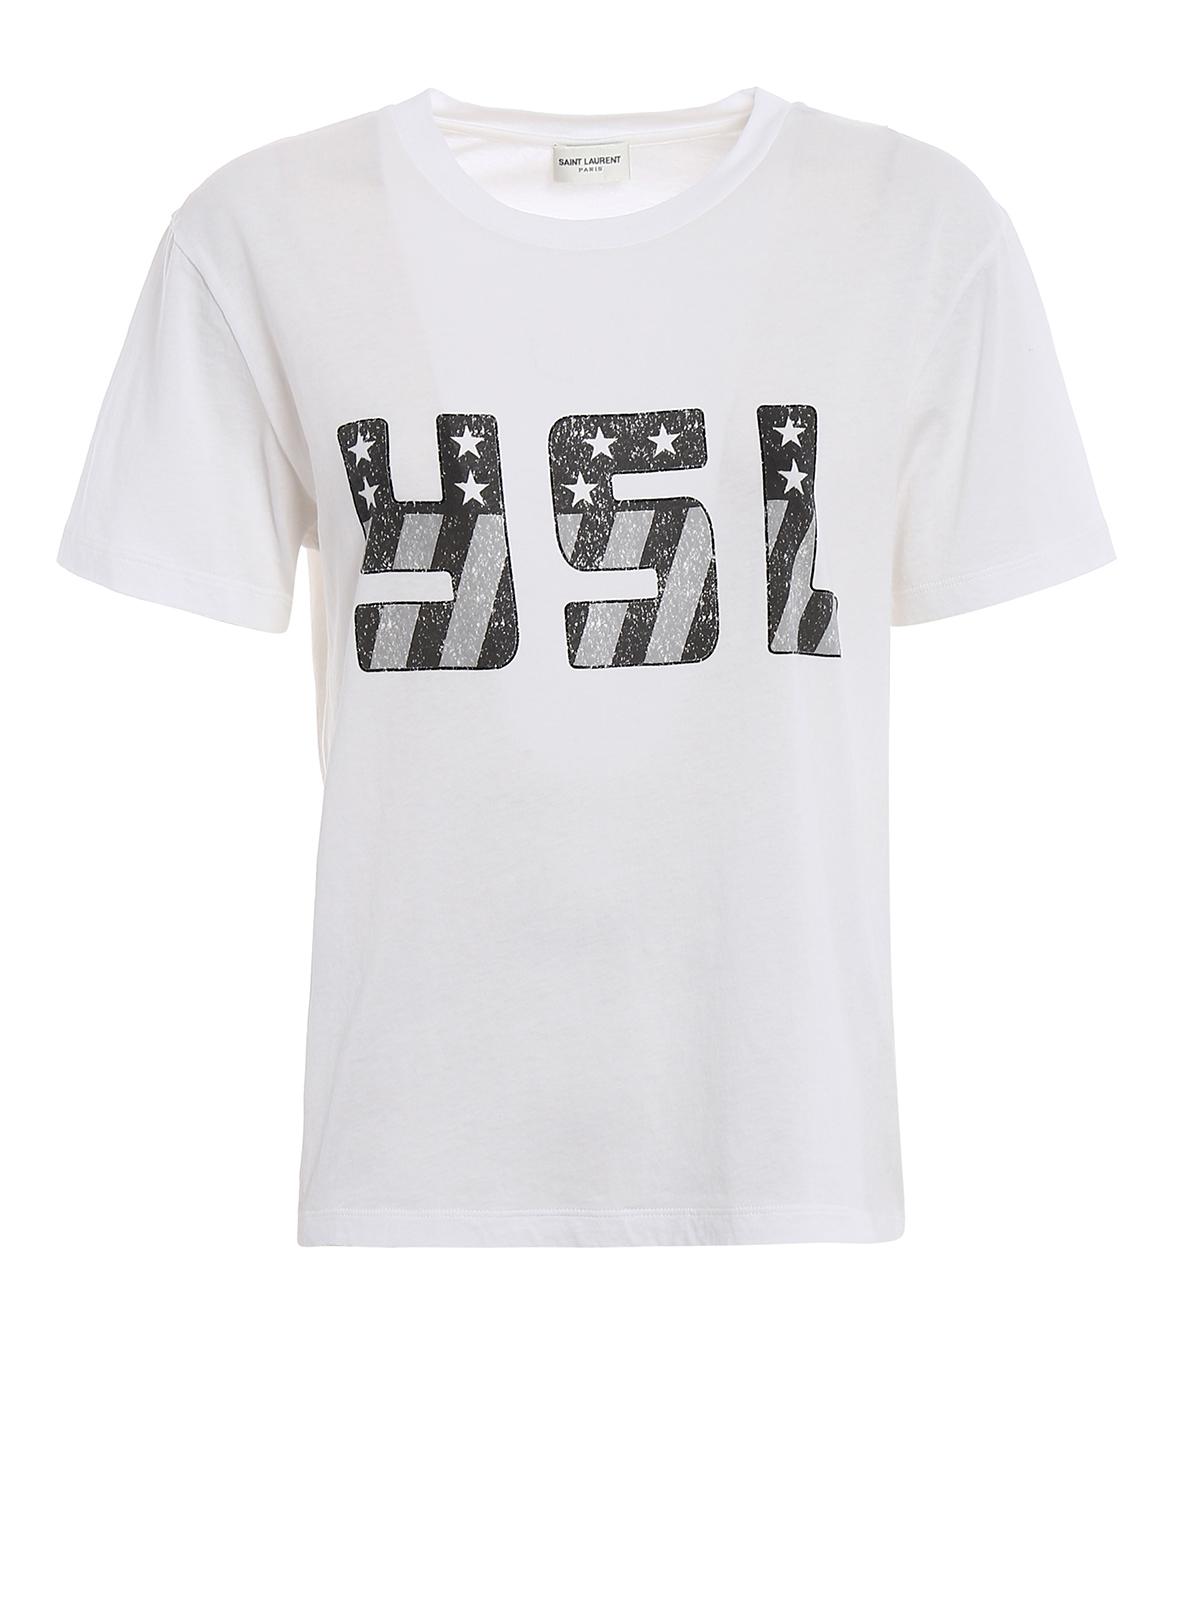 Ysl print white t shirt by saint laurent t shirts ikrix for Saint laurent t shirt